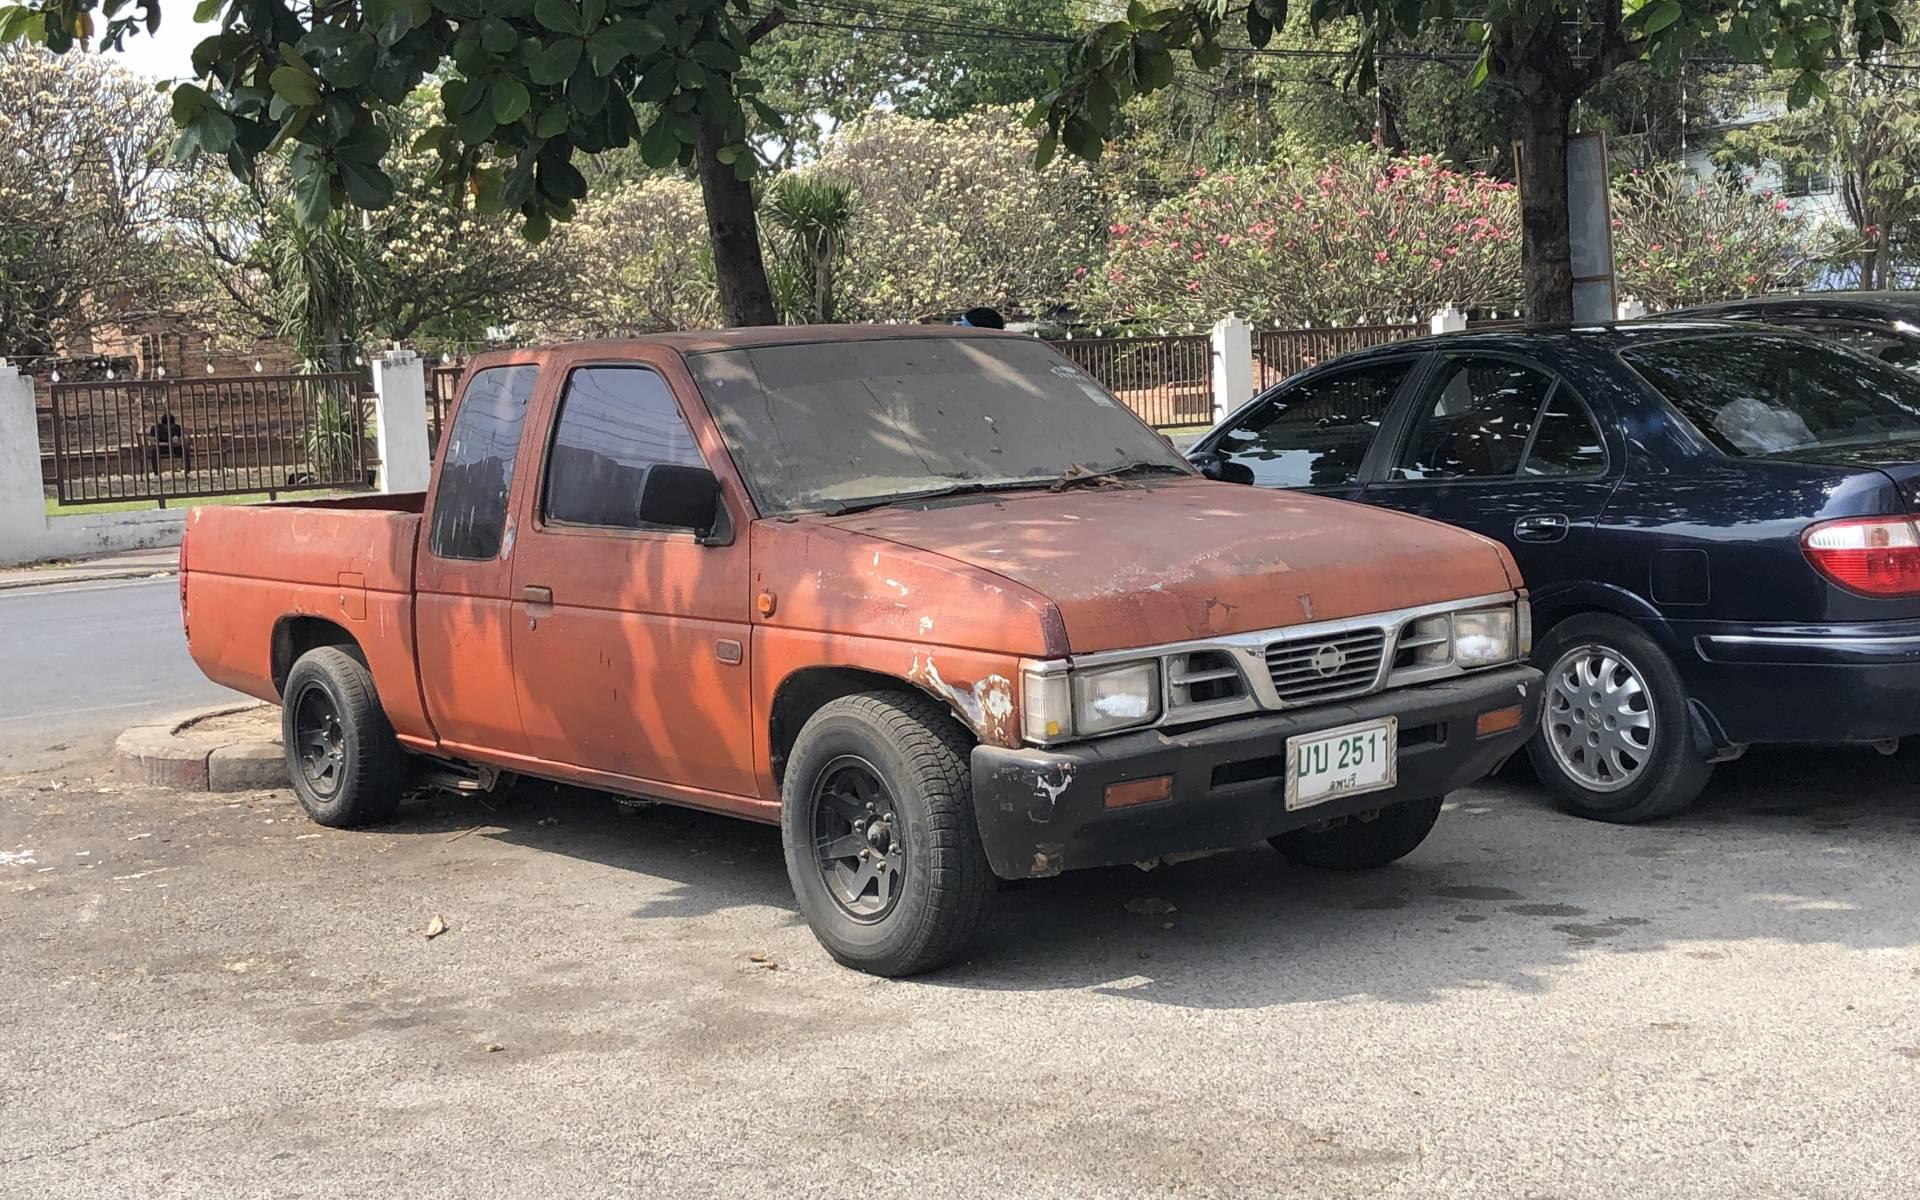 <p><strong>Nissan Hardbody</strong></p>